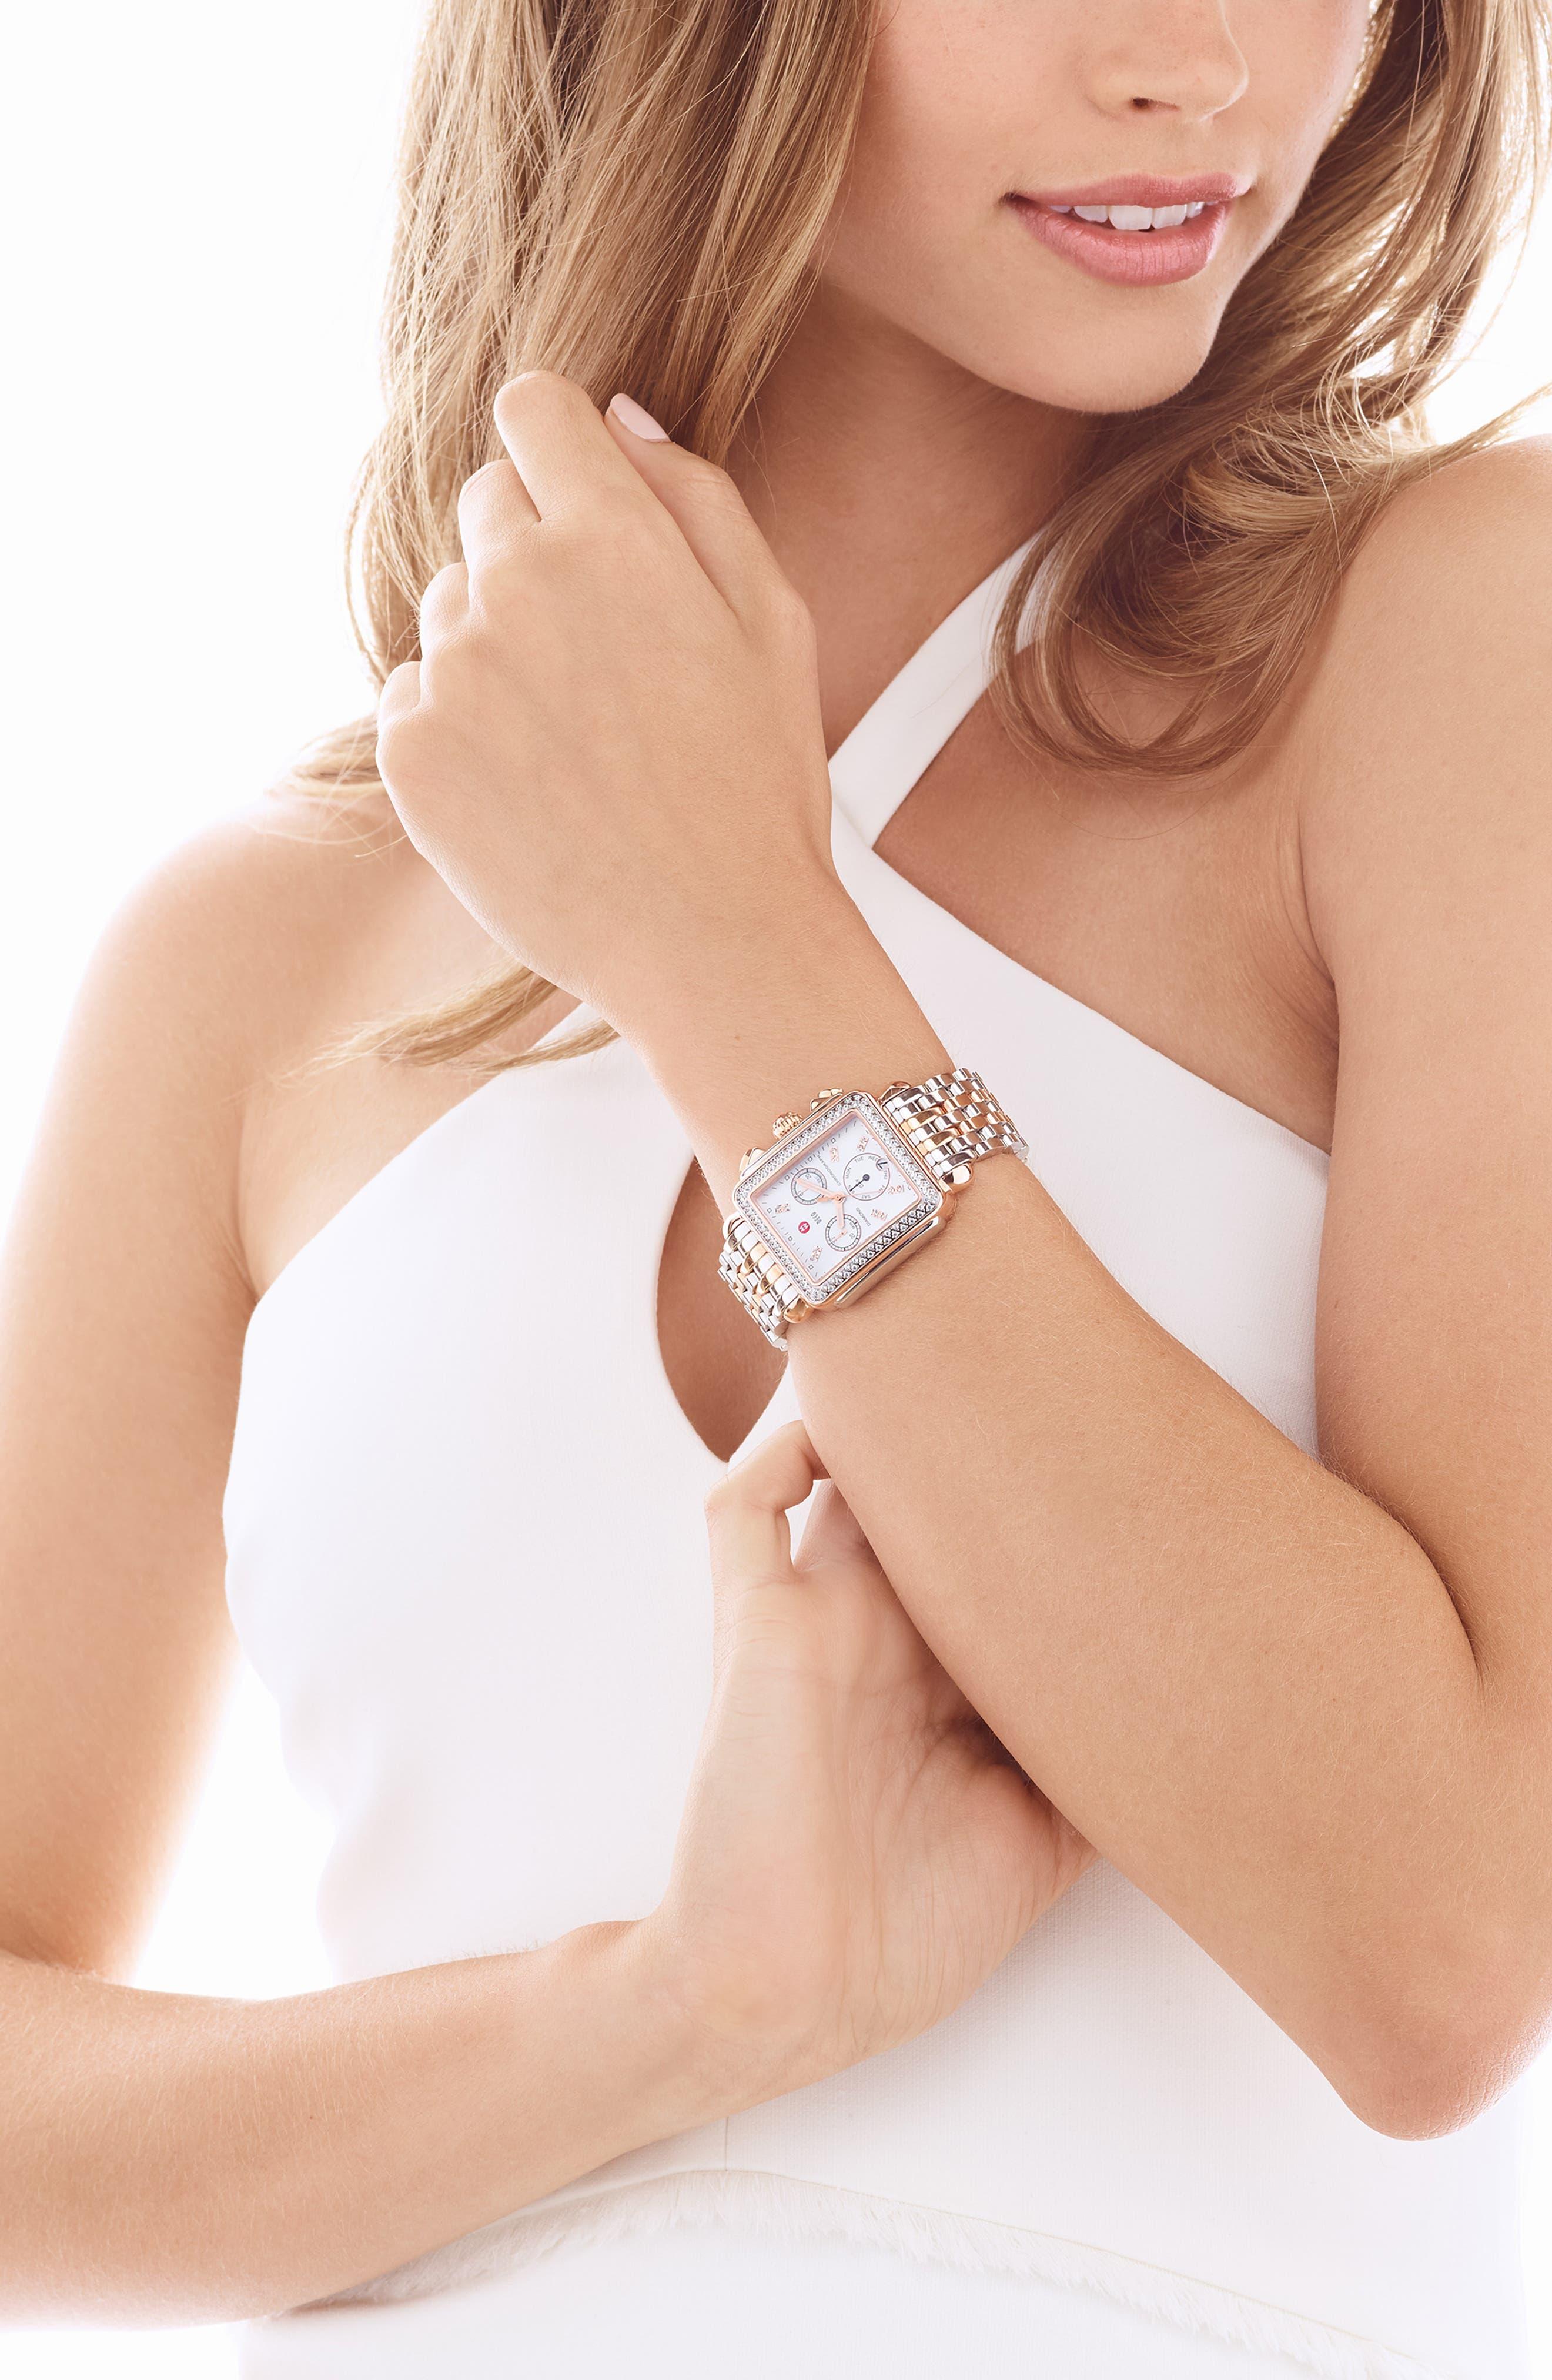 Deco 18mm Bracelet Watchband,                             Alternate thumbnail 2, color,                             Silver/ Rose Gold